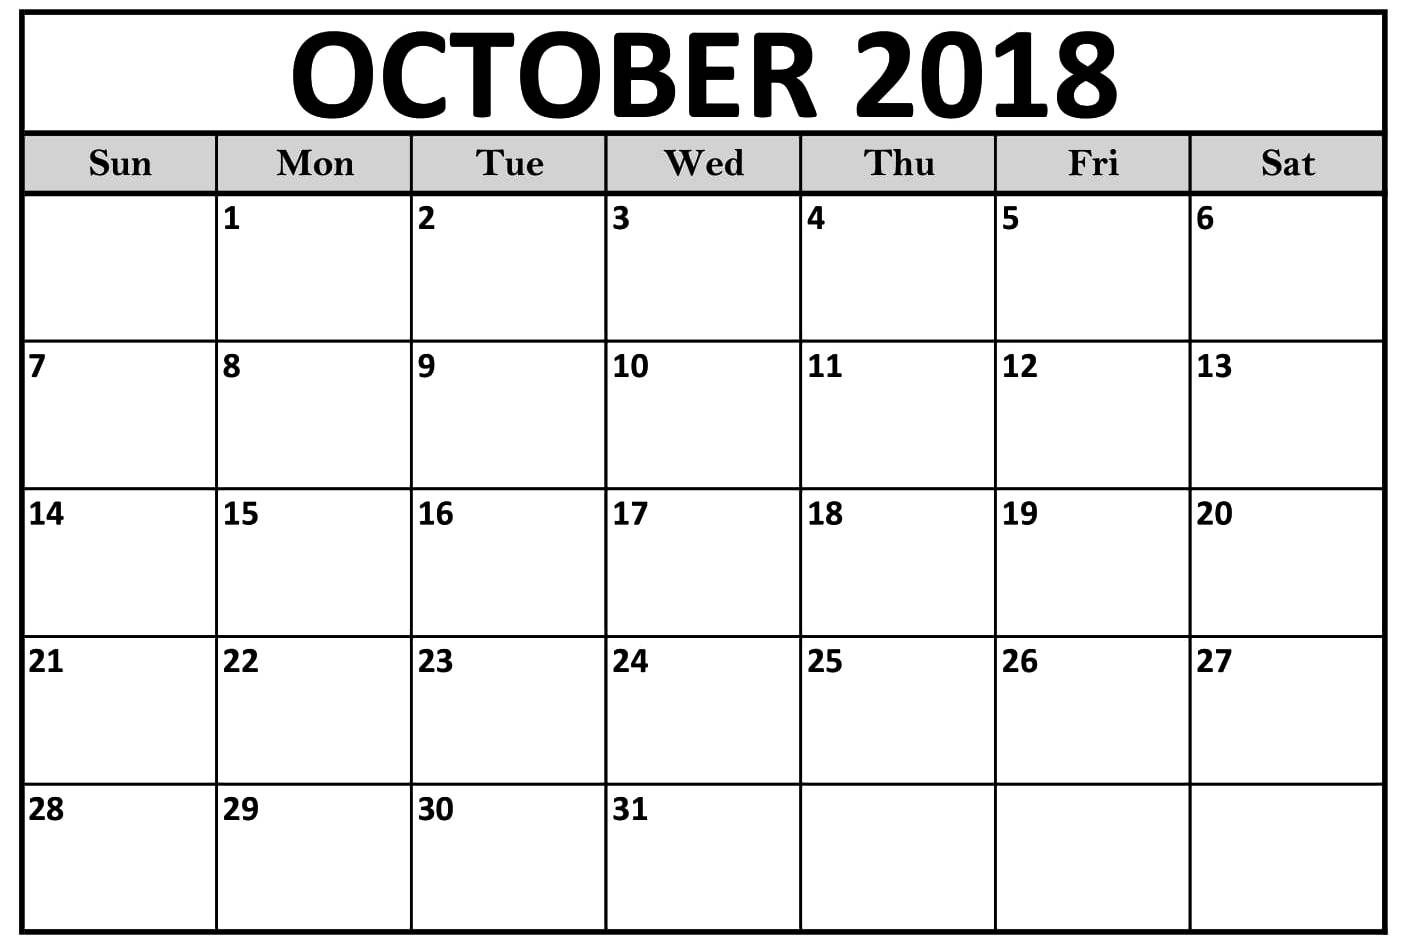 October 2018 Calendar Printable Landscape | October 2018 with regard to Free Printable Pocket Calendar